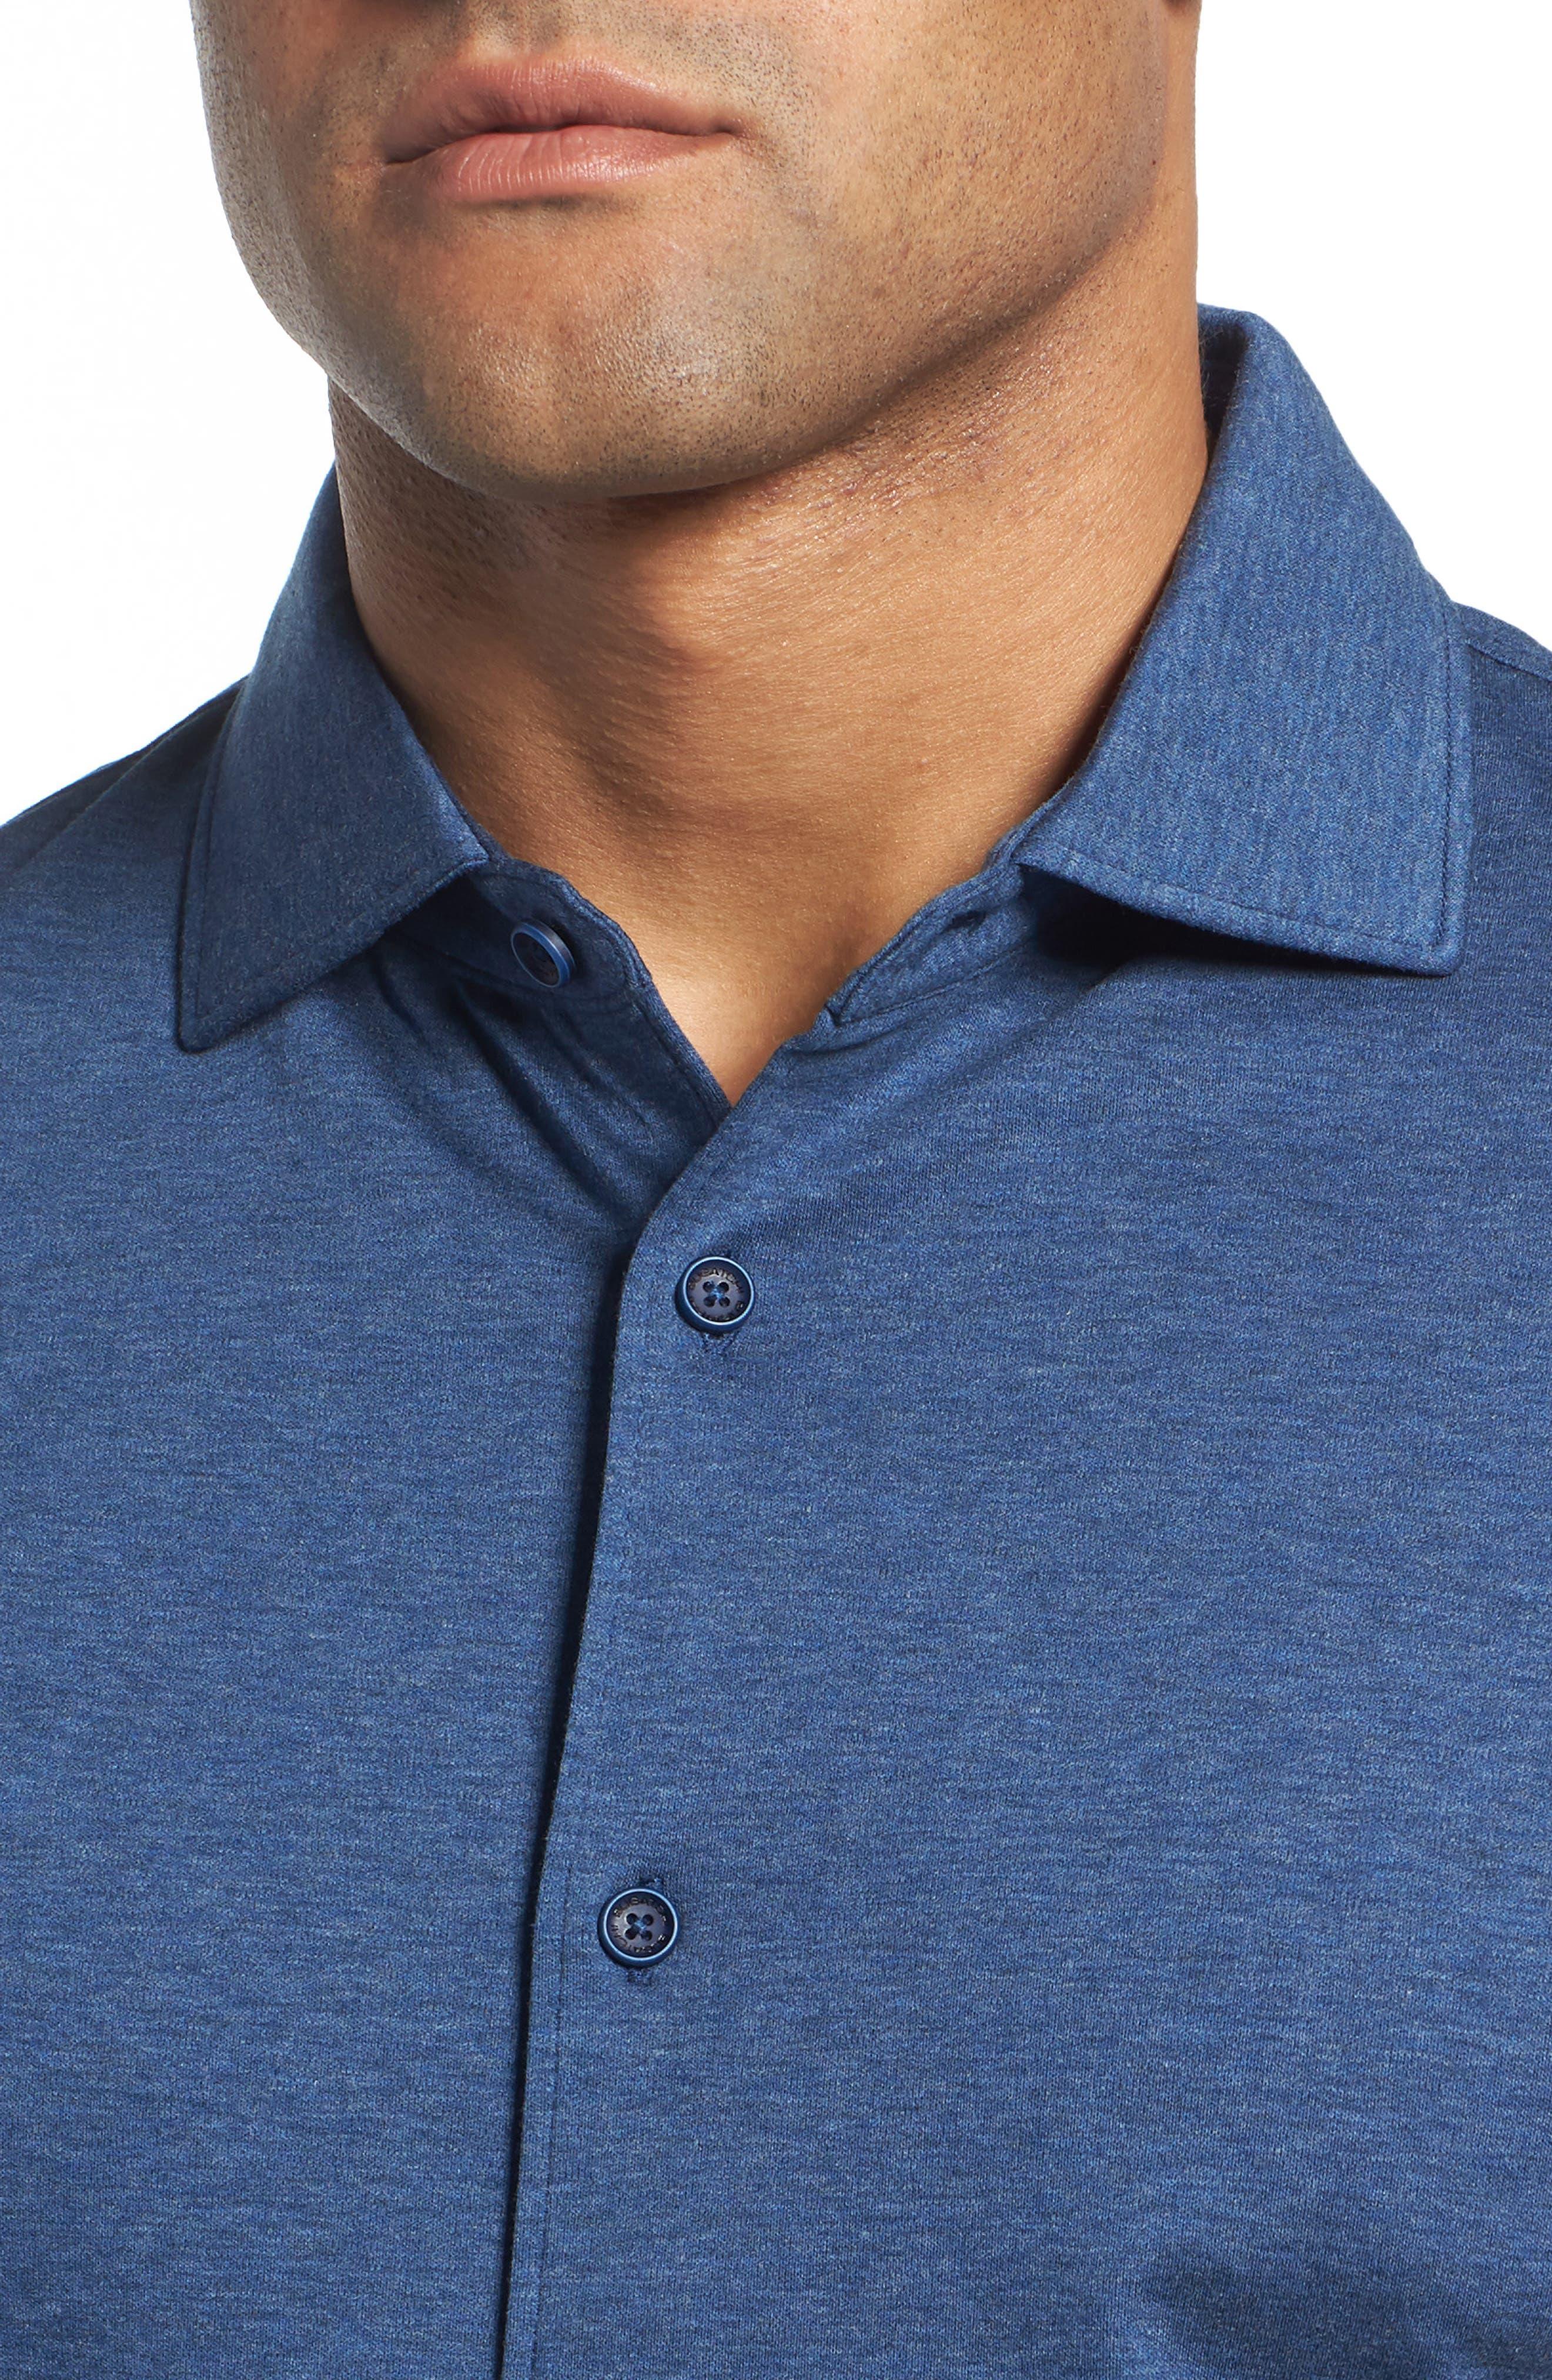 Regular Fit Heather Knit Sport Shirt,                             Alternate thumbnail 4, color,                             NAVY